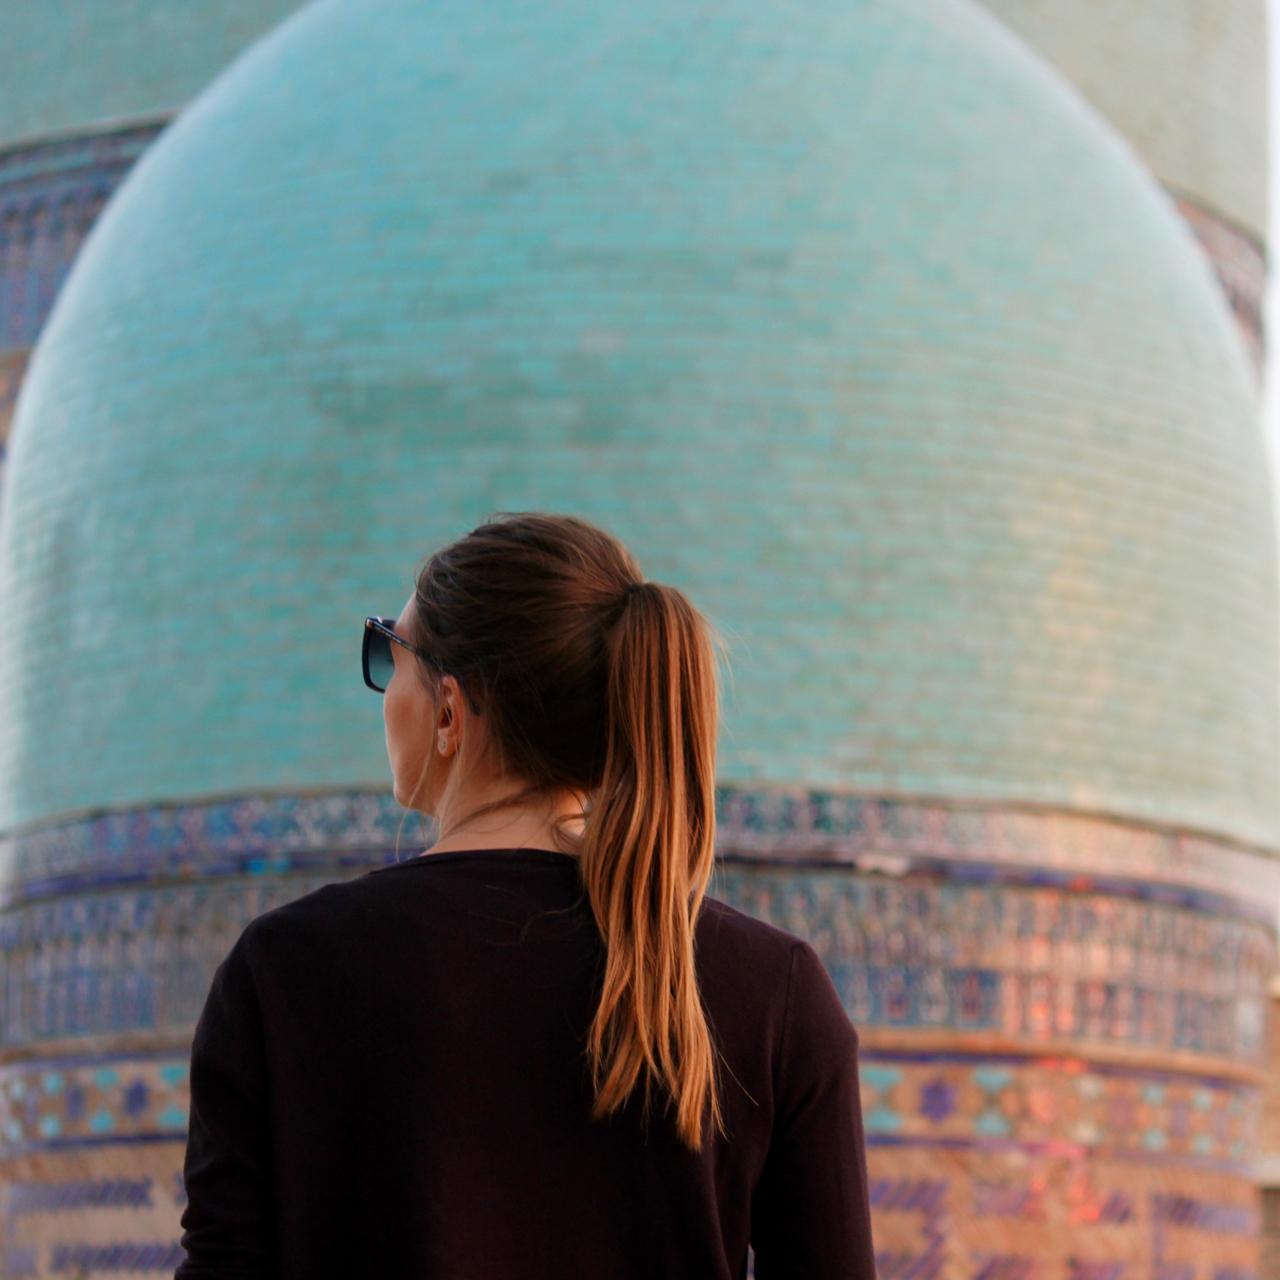 samarkand, uzbekistan - 28